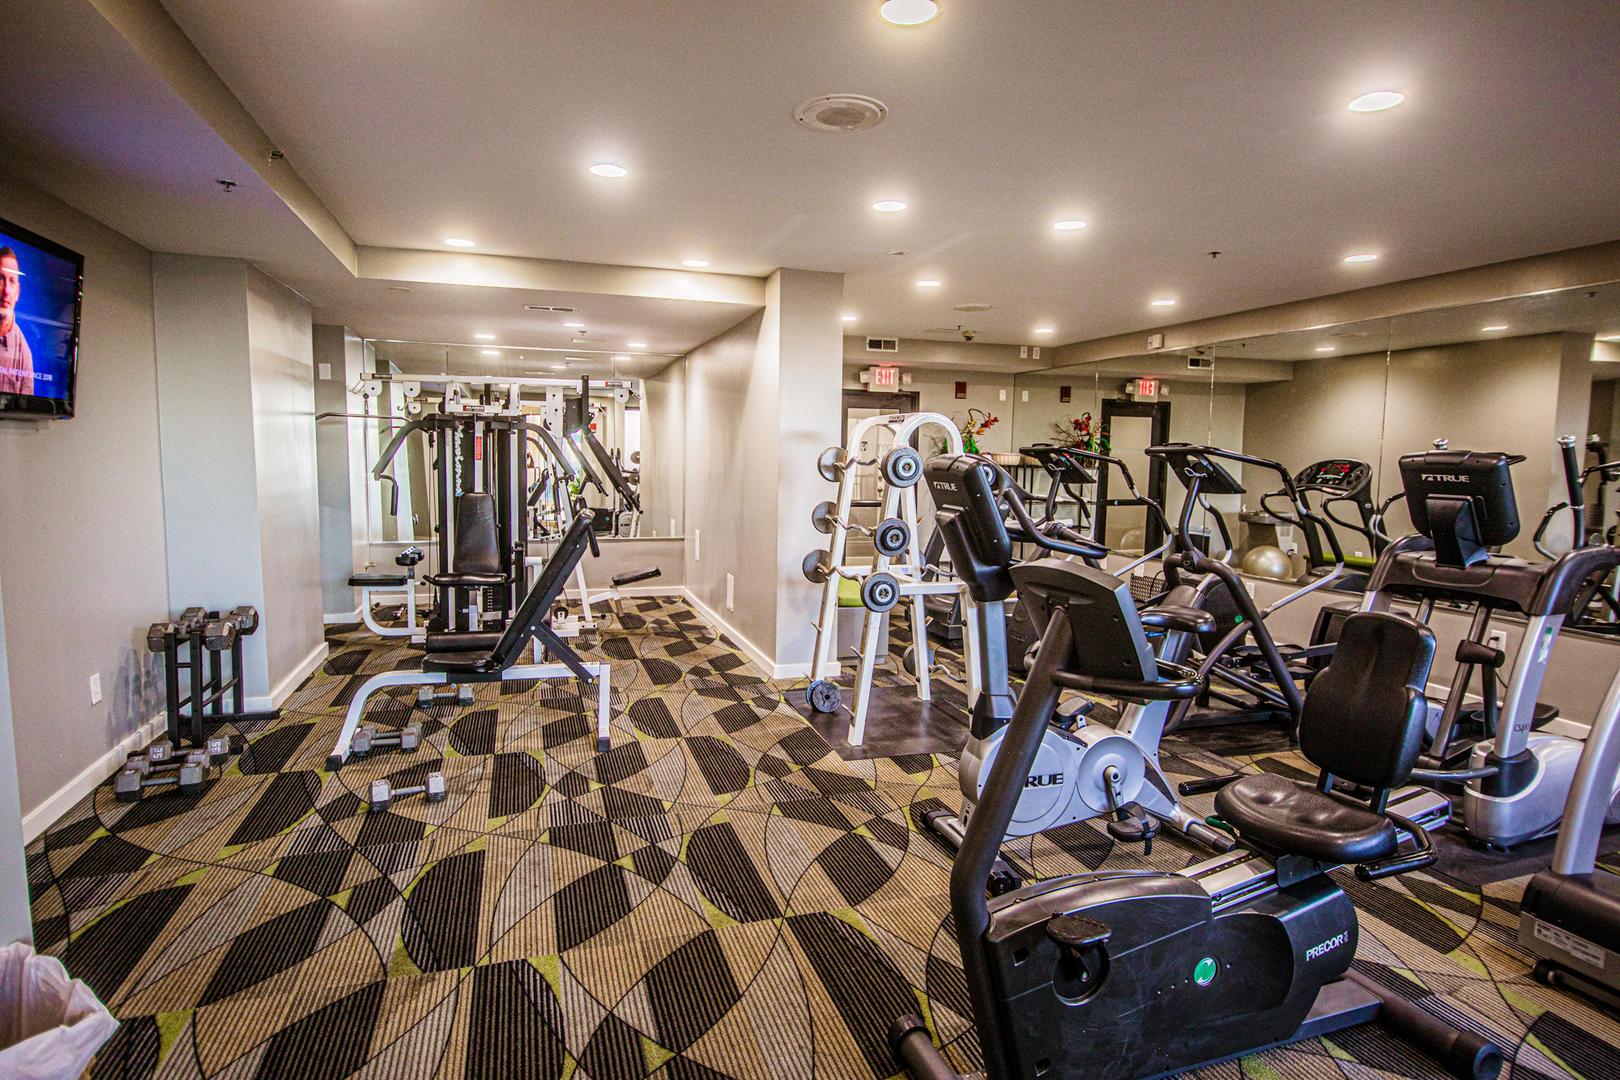 Patricia Grand Fitness Center